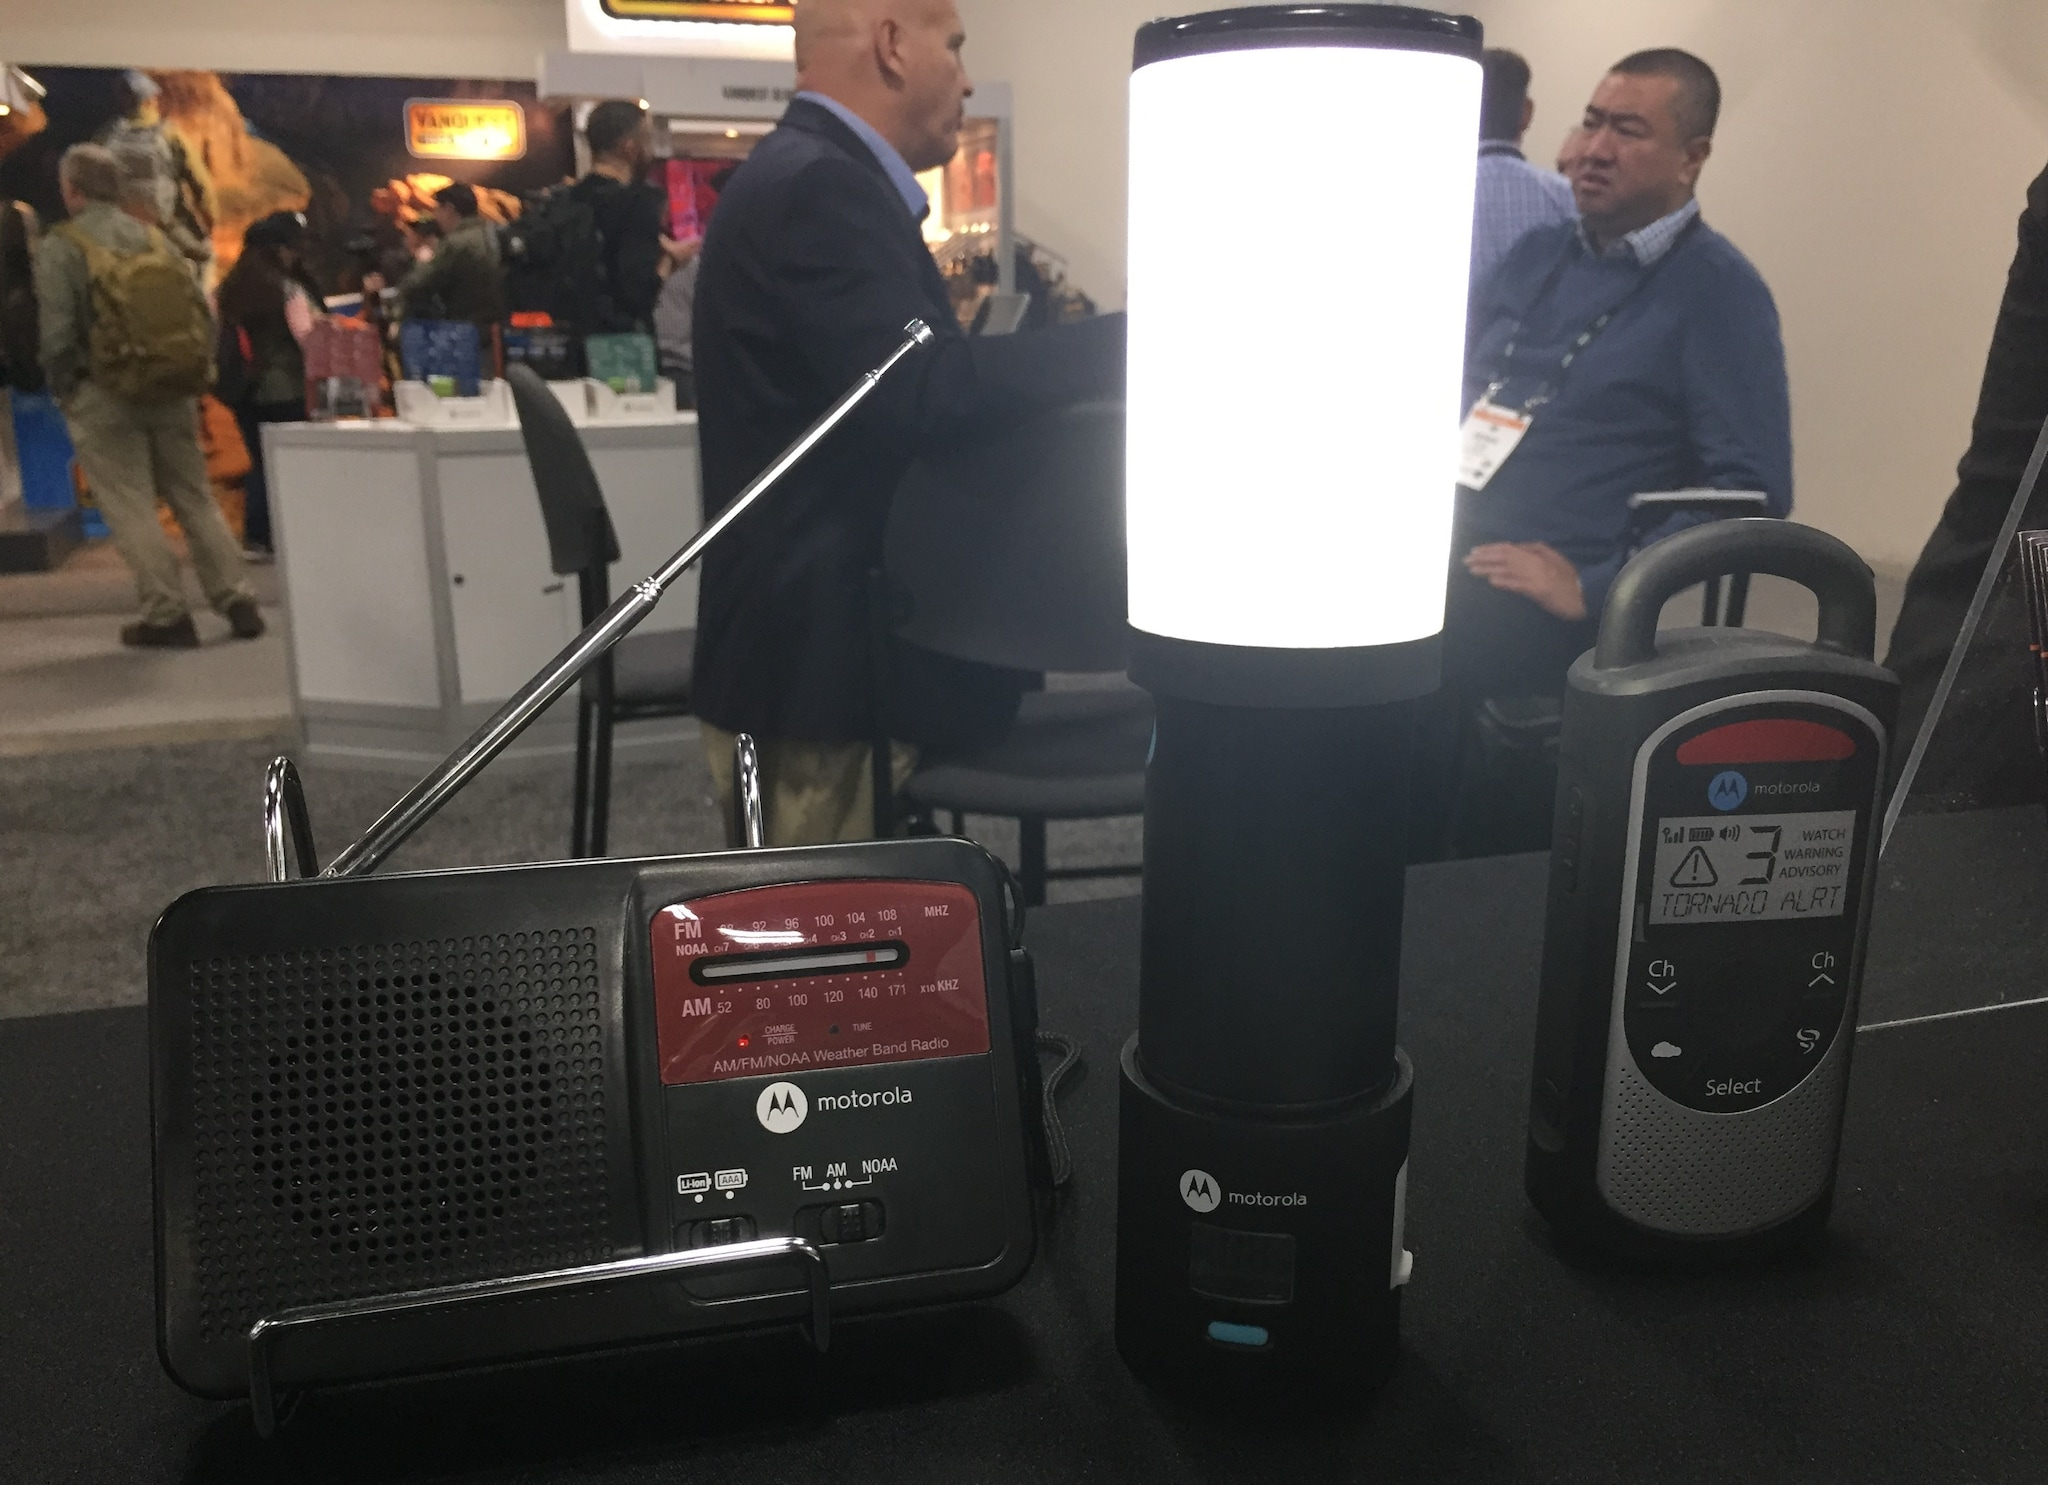 Motorola stuff